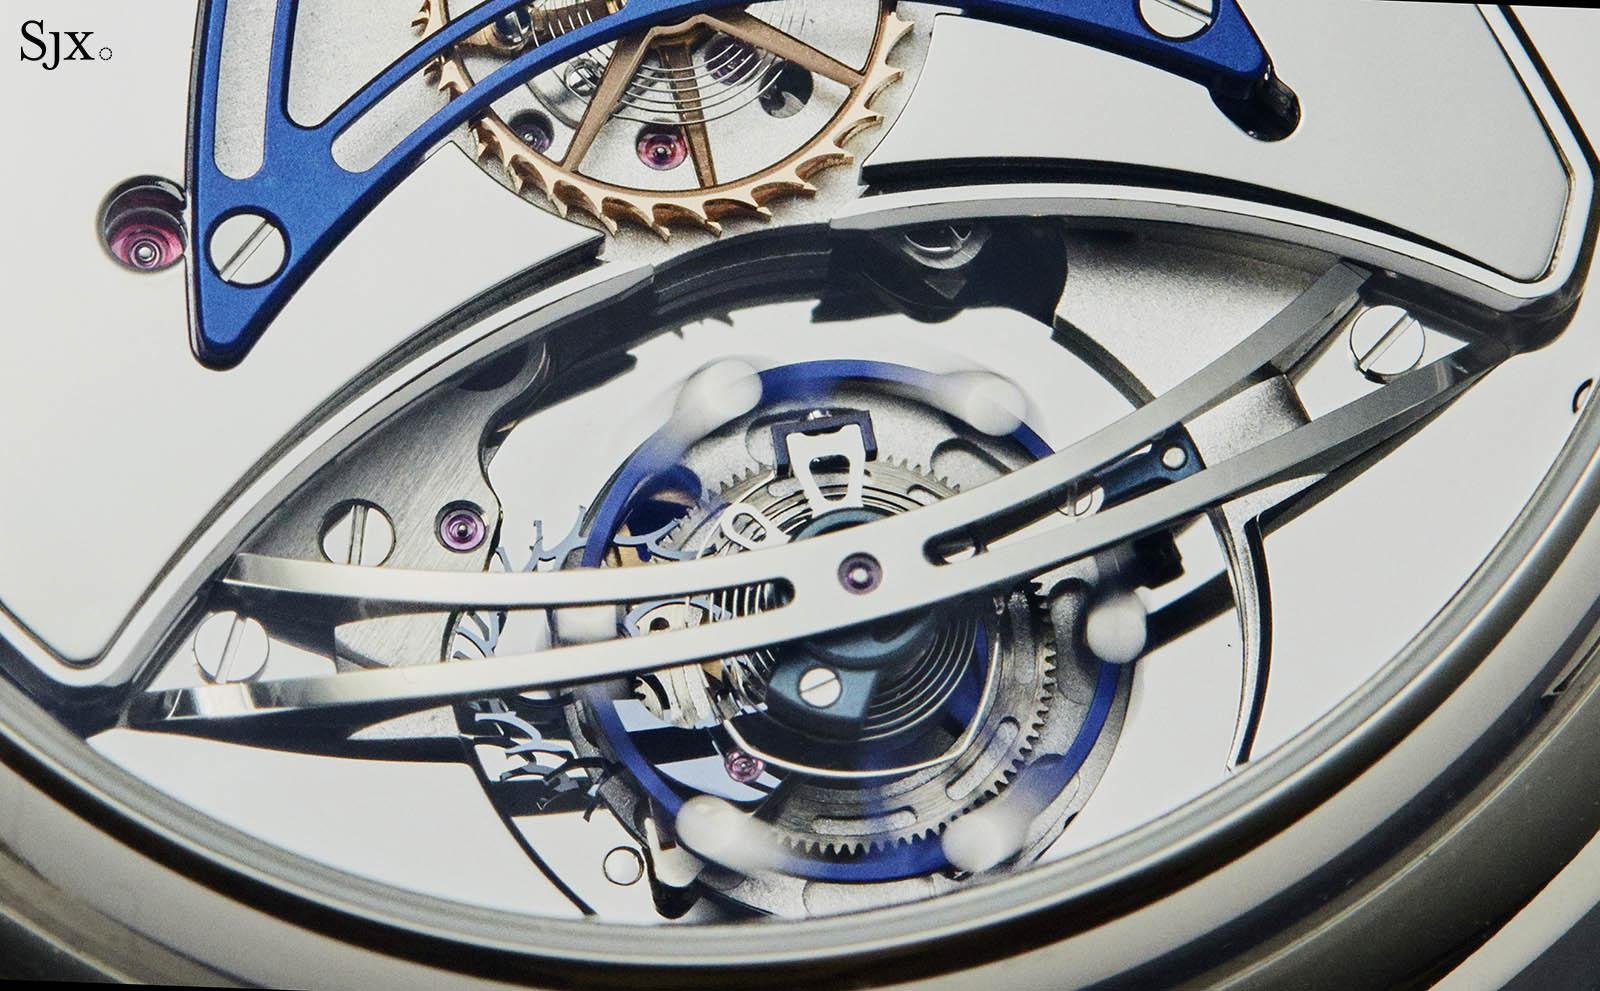 De Bethune DB25 Starry Varius Chronomètre Tourbillon_1.1